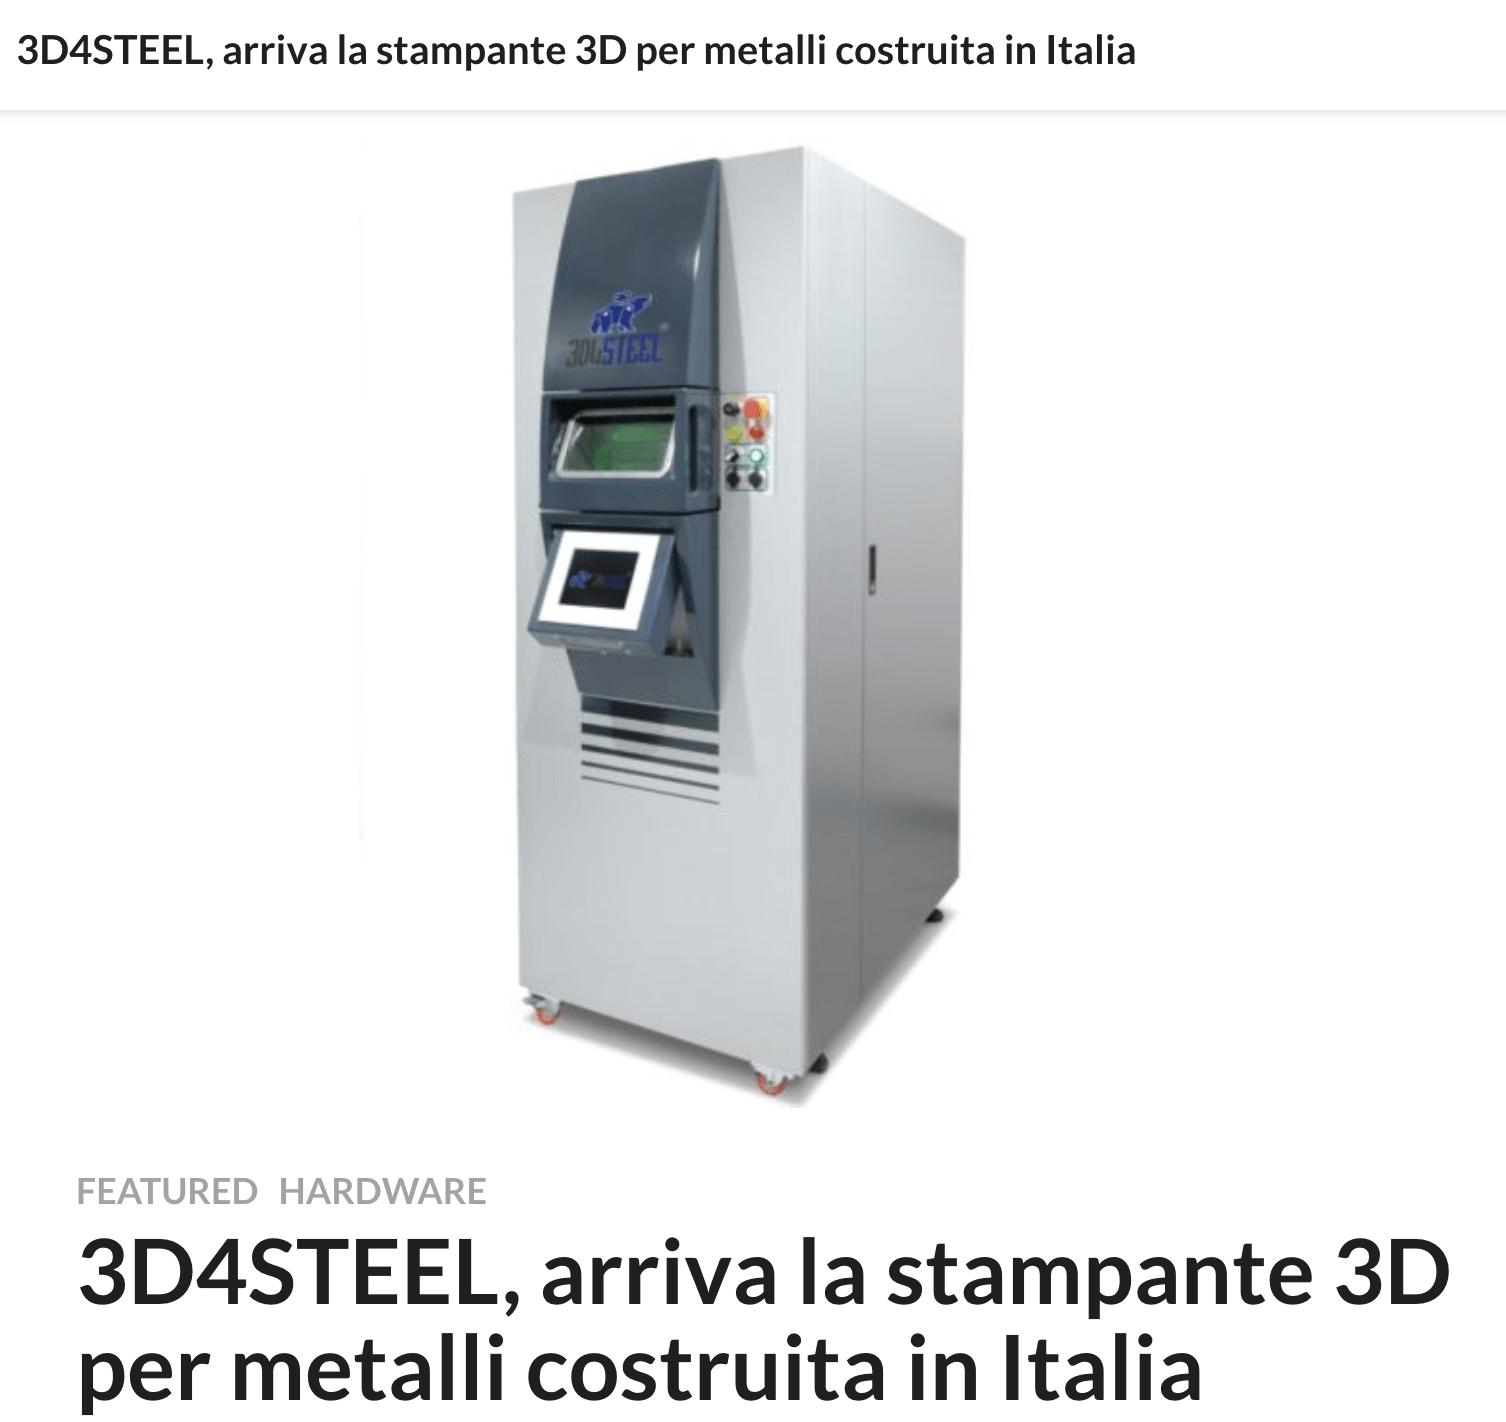 [Tech Business] 3D4STEEL, arriva la stampante 3D per metalli costruita in Italia